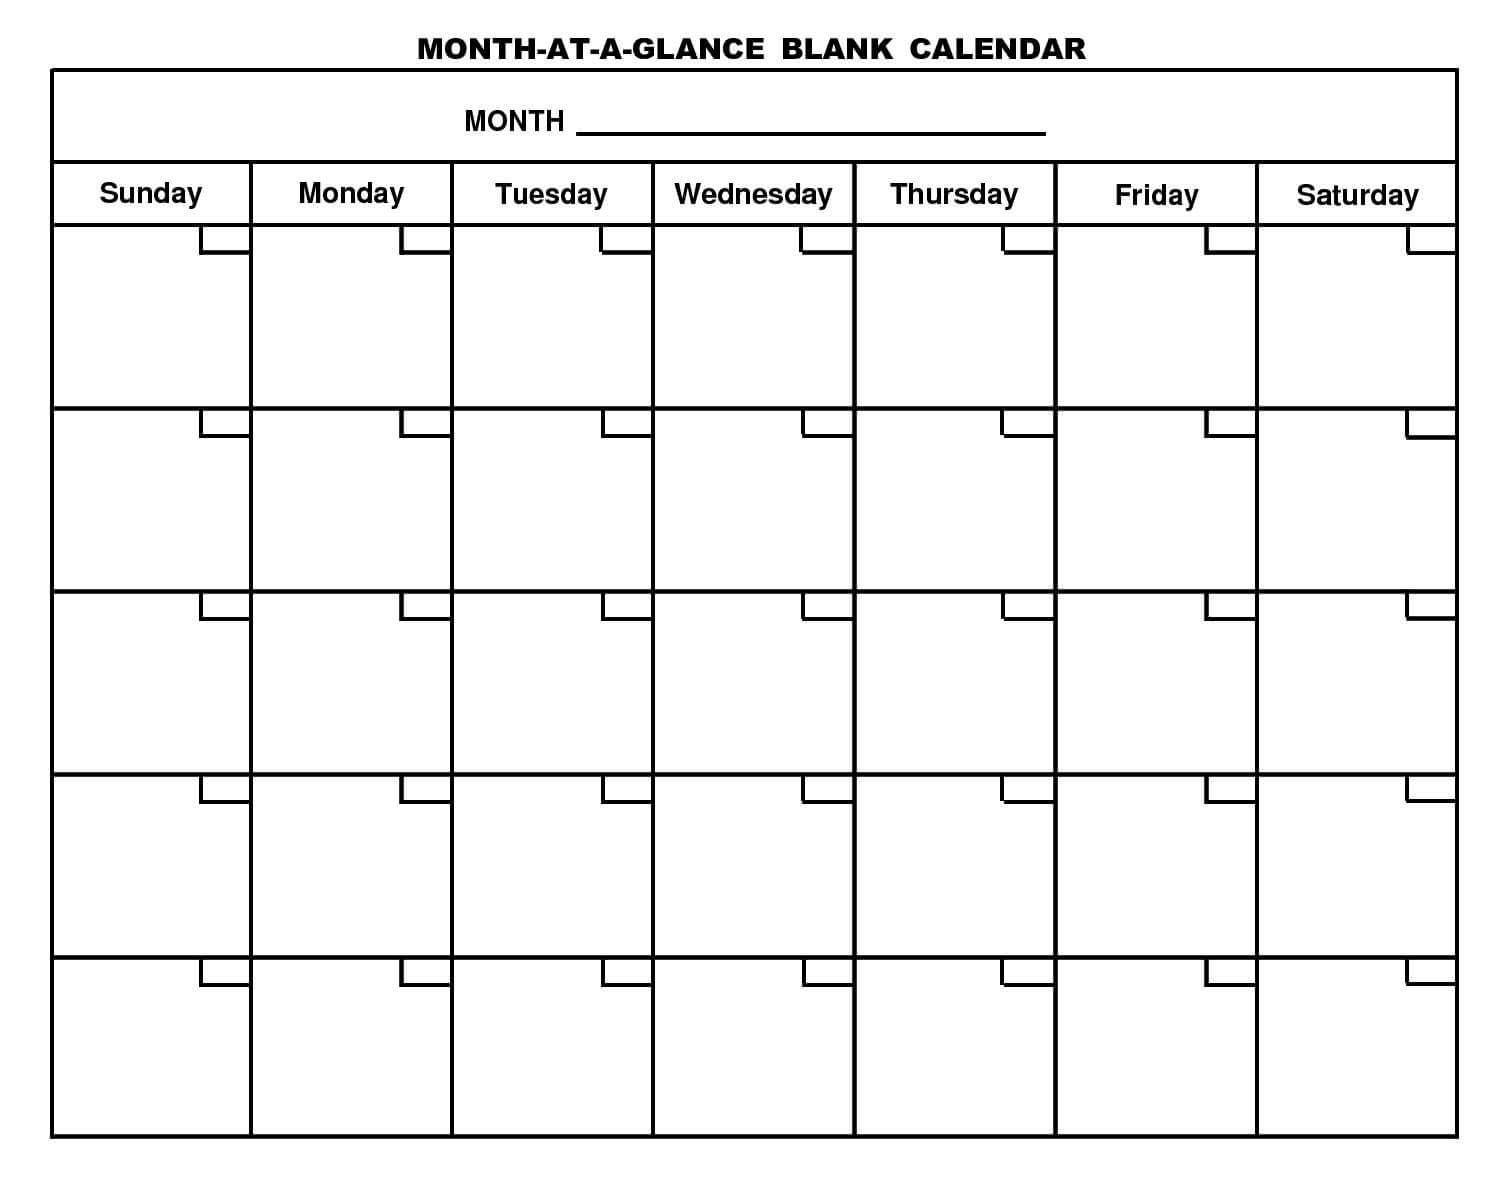 Pinstacy Tangren On Work | Blank Monthly Calendar Throughout Month At A Glance Blank Calendar Template